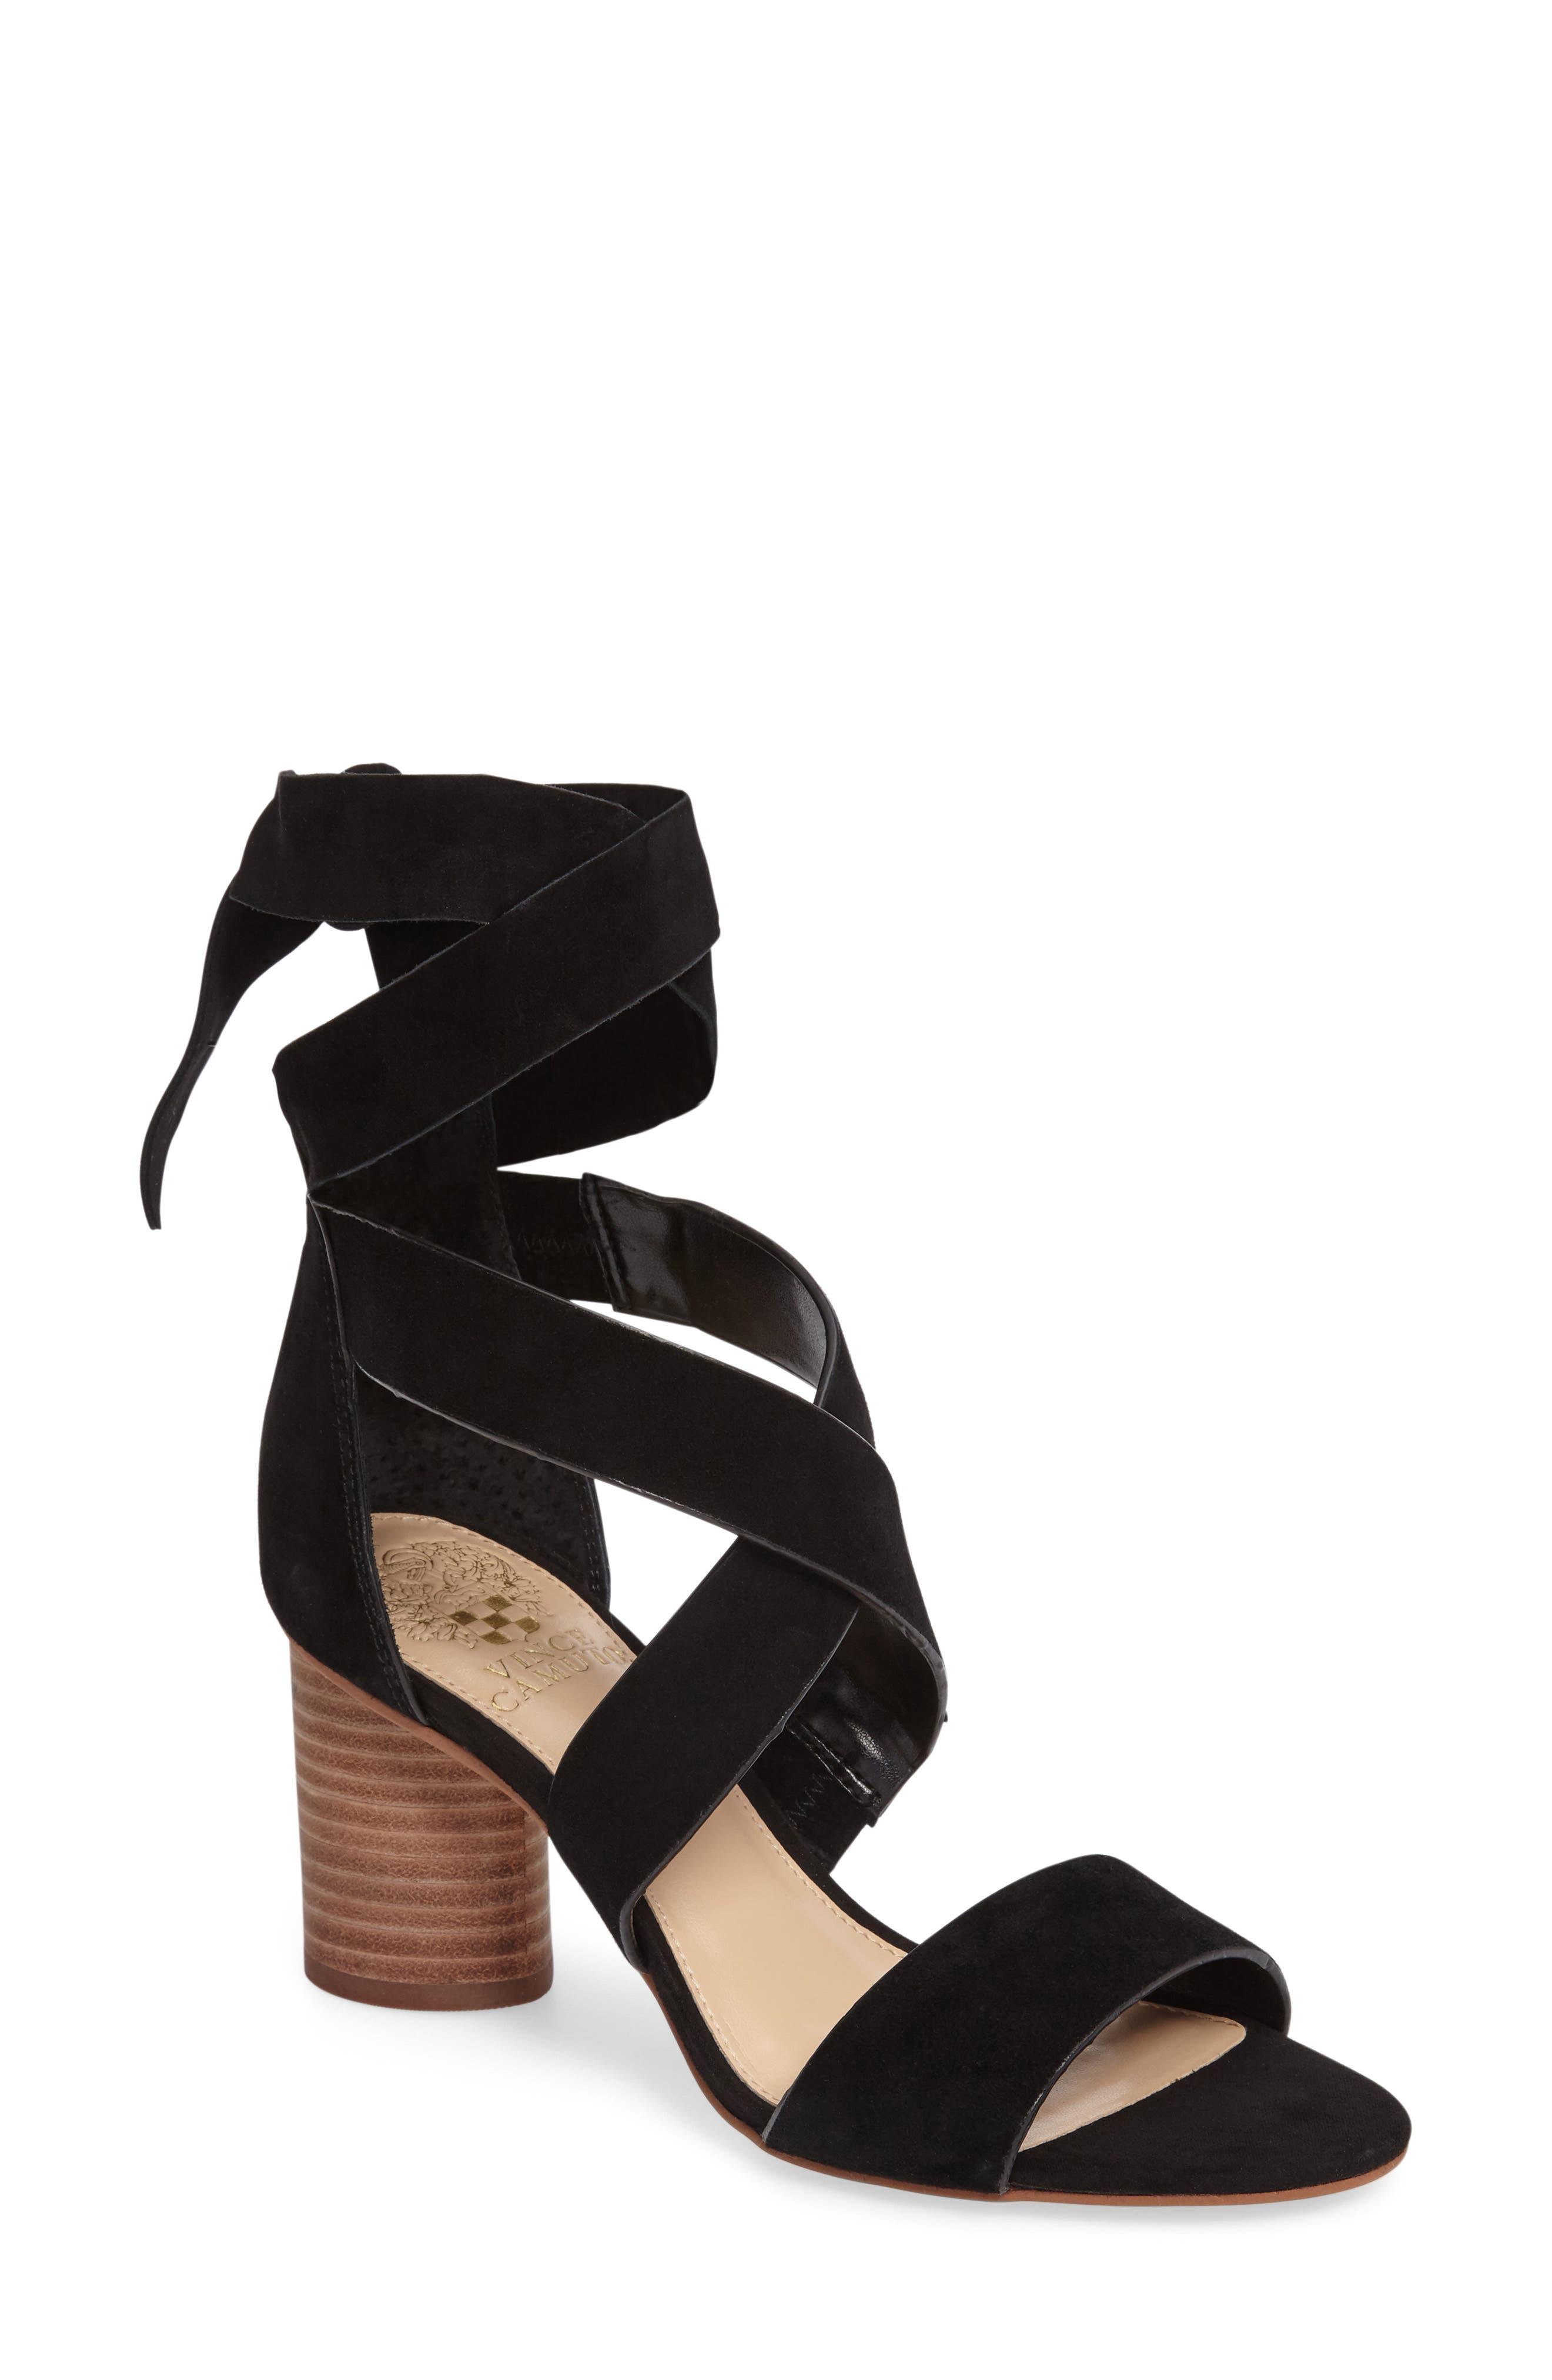 Jeneve Block Heel Sandal,                         Main,                         color, 001